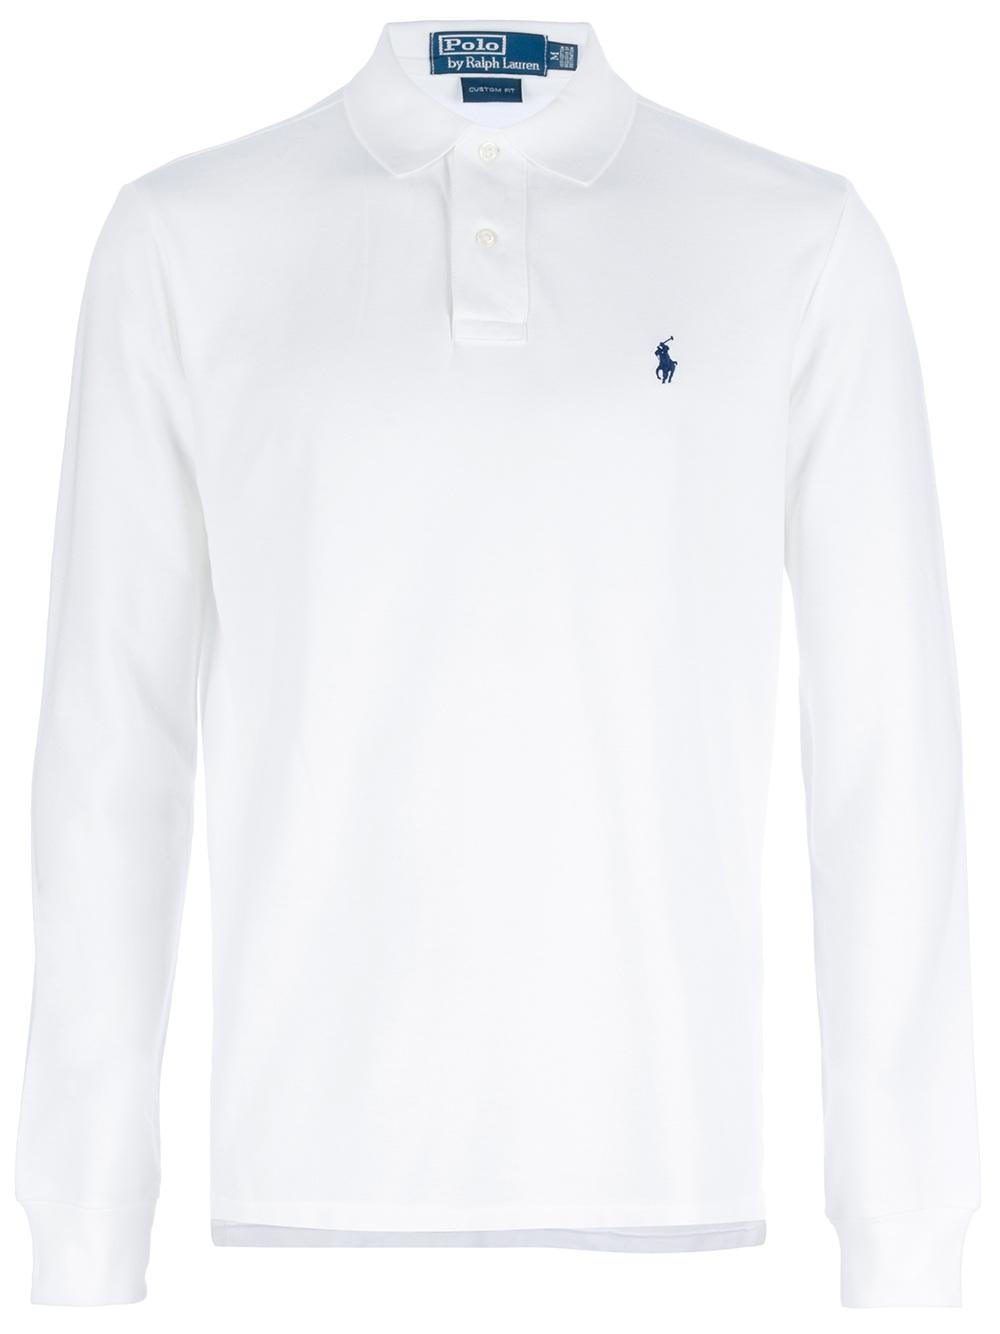 9dfd1eb328 Lyst - Ralph Lauren Blue Label Long Sleeve Polo Shirt in White for Men